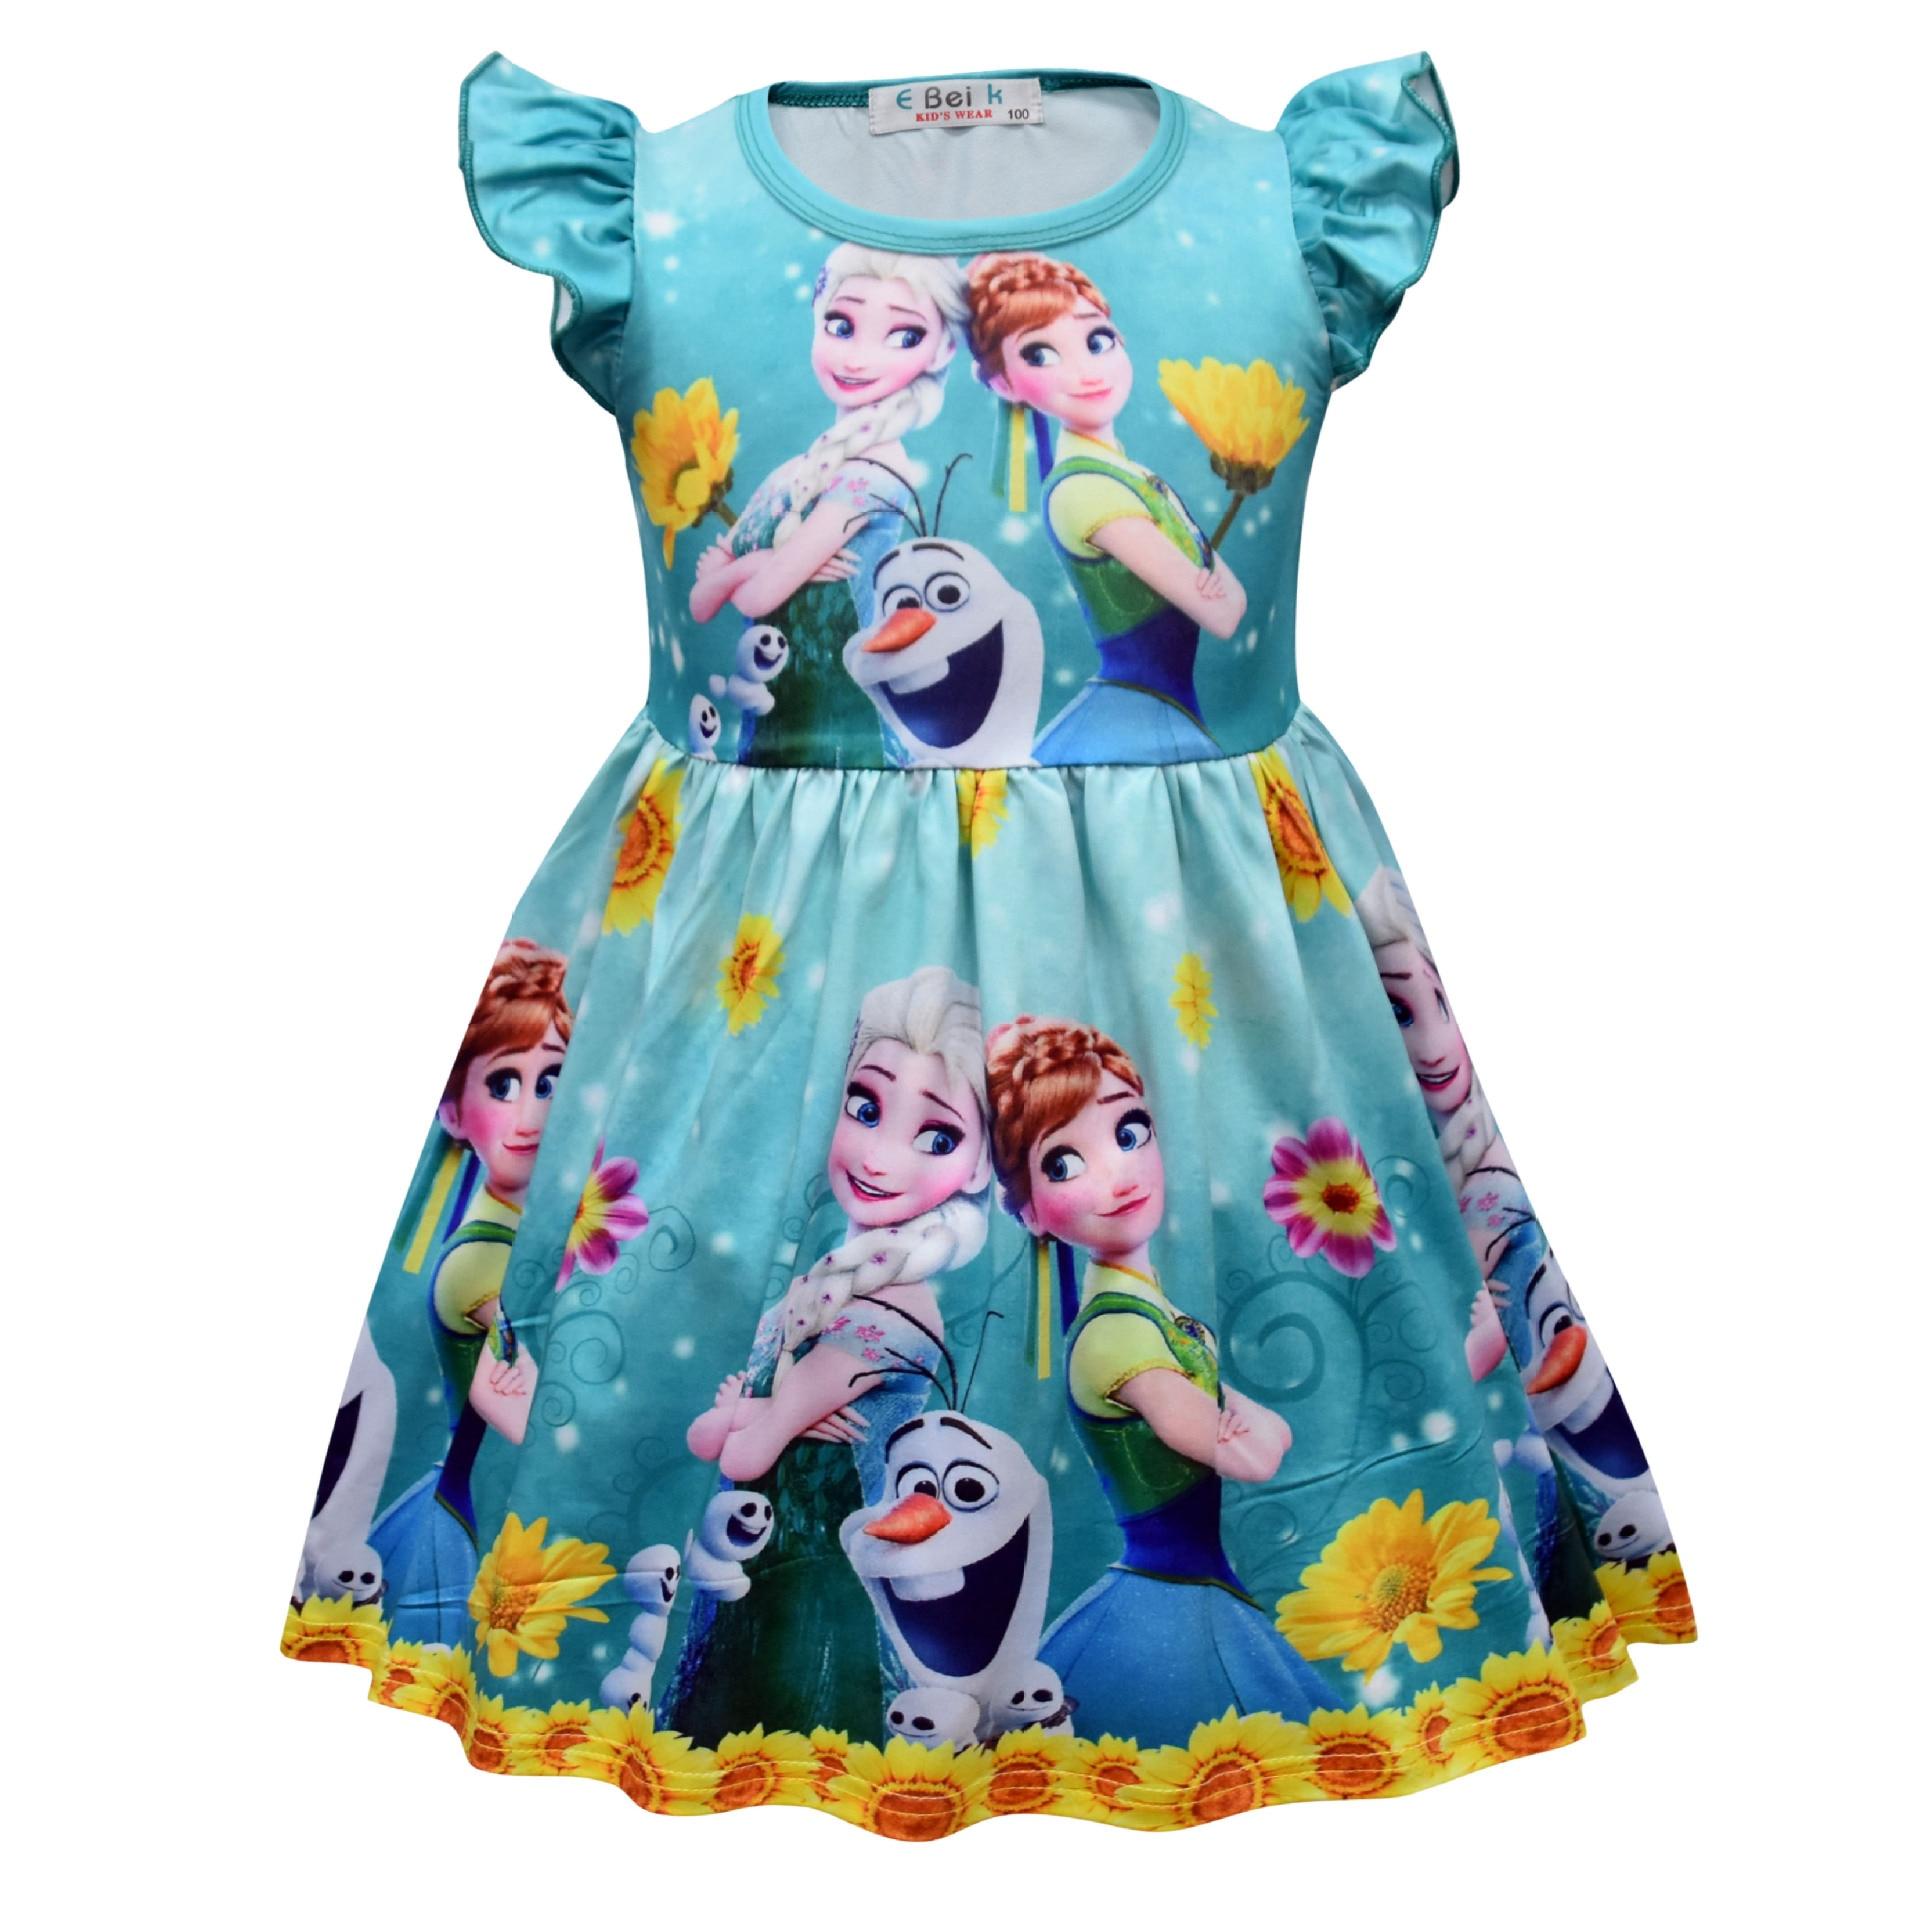 Vestido de princesa Twirl girasol Anna Aisha vestido de princesa niñas aleteo manga vestido de seda color leche Boutique verano fiesta Niñas Ropa